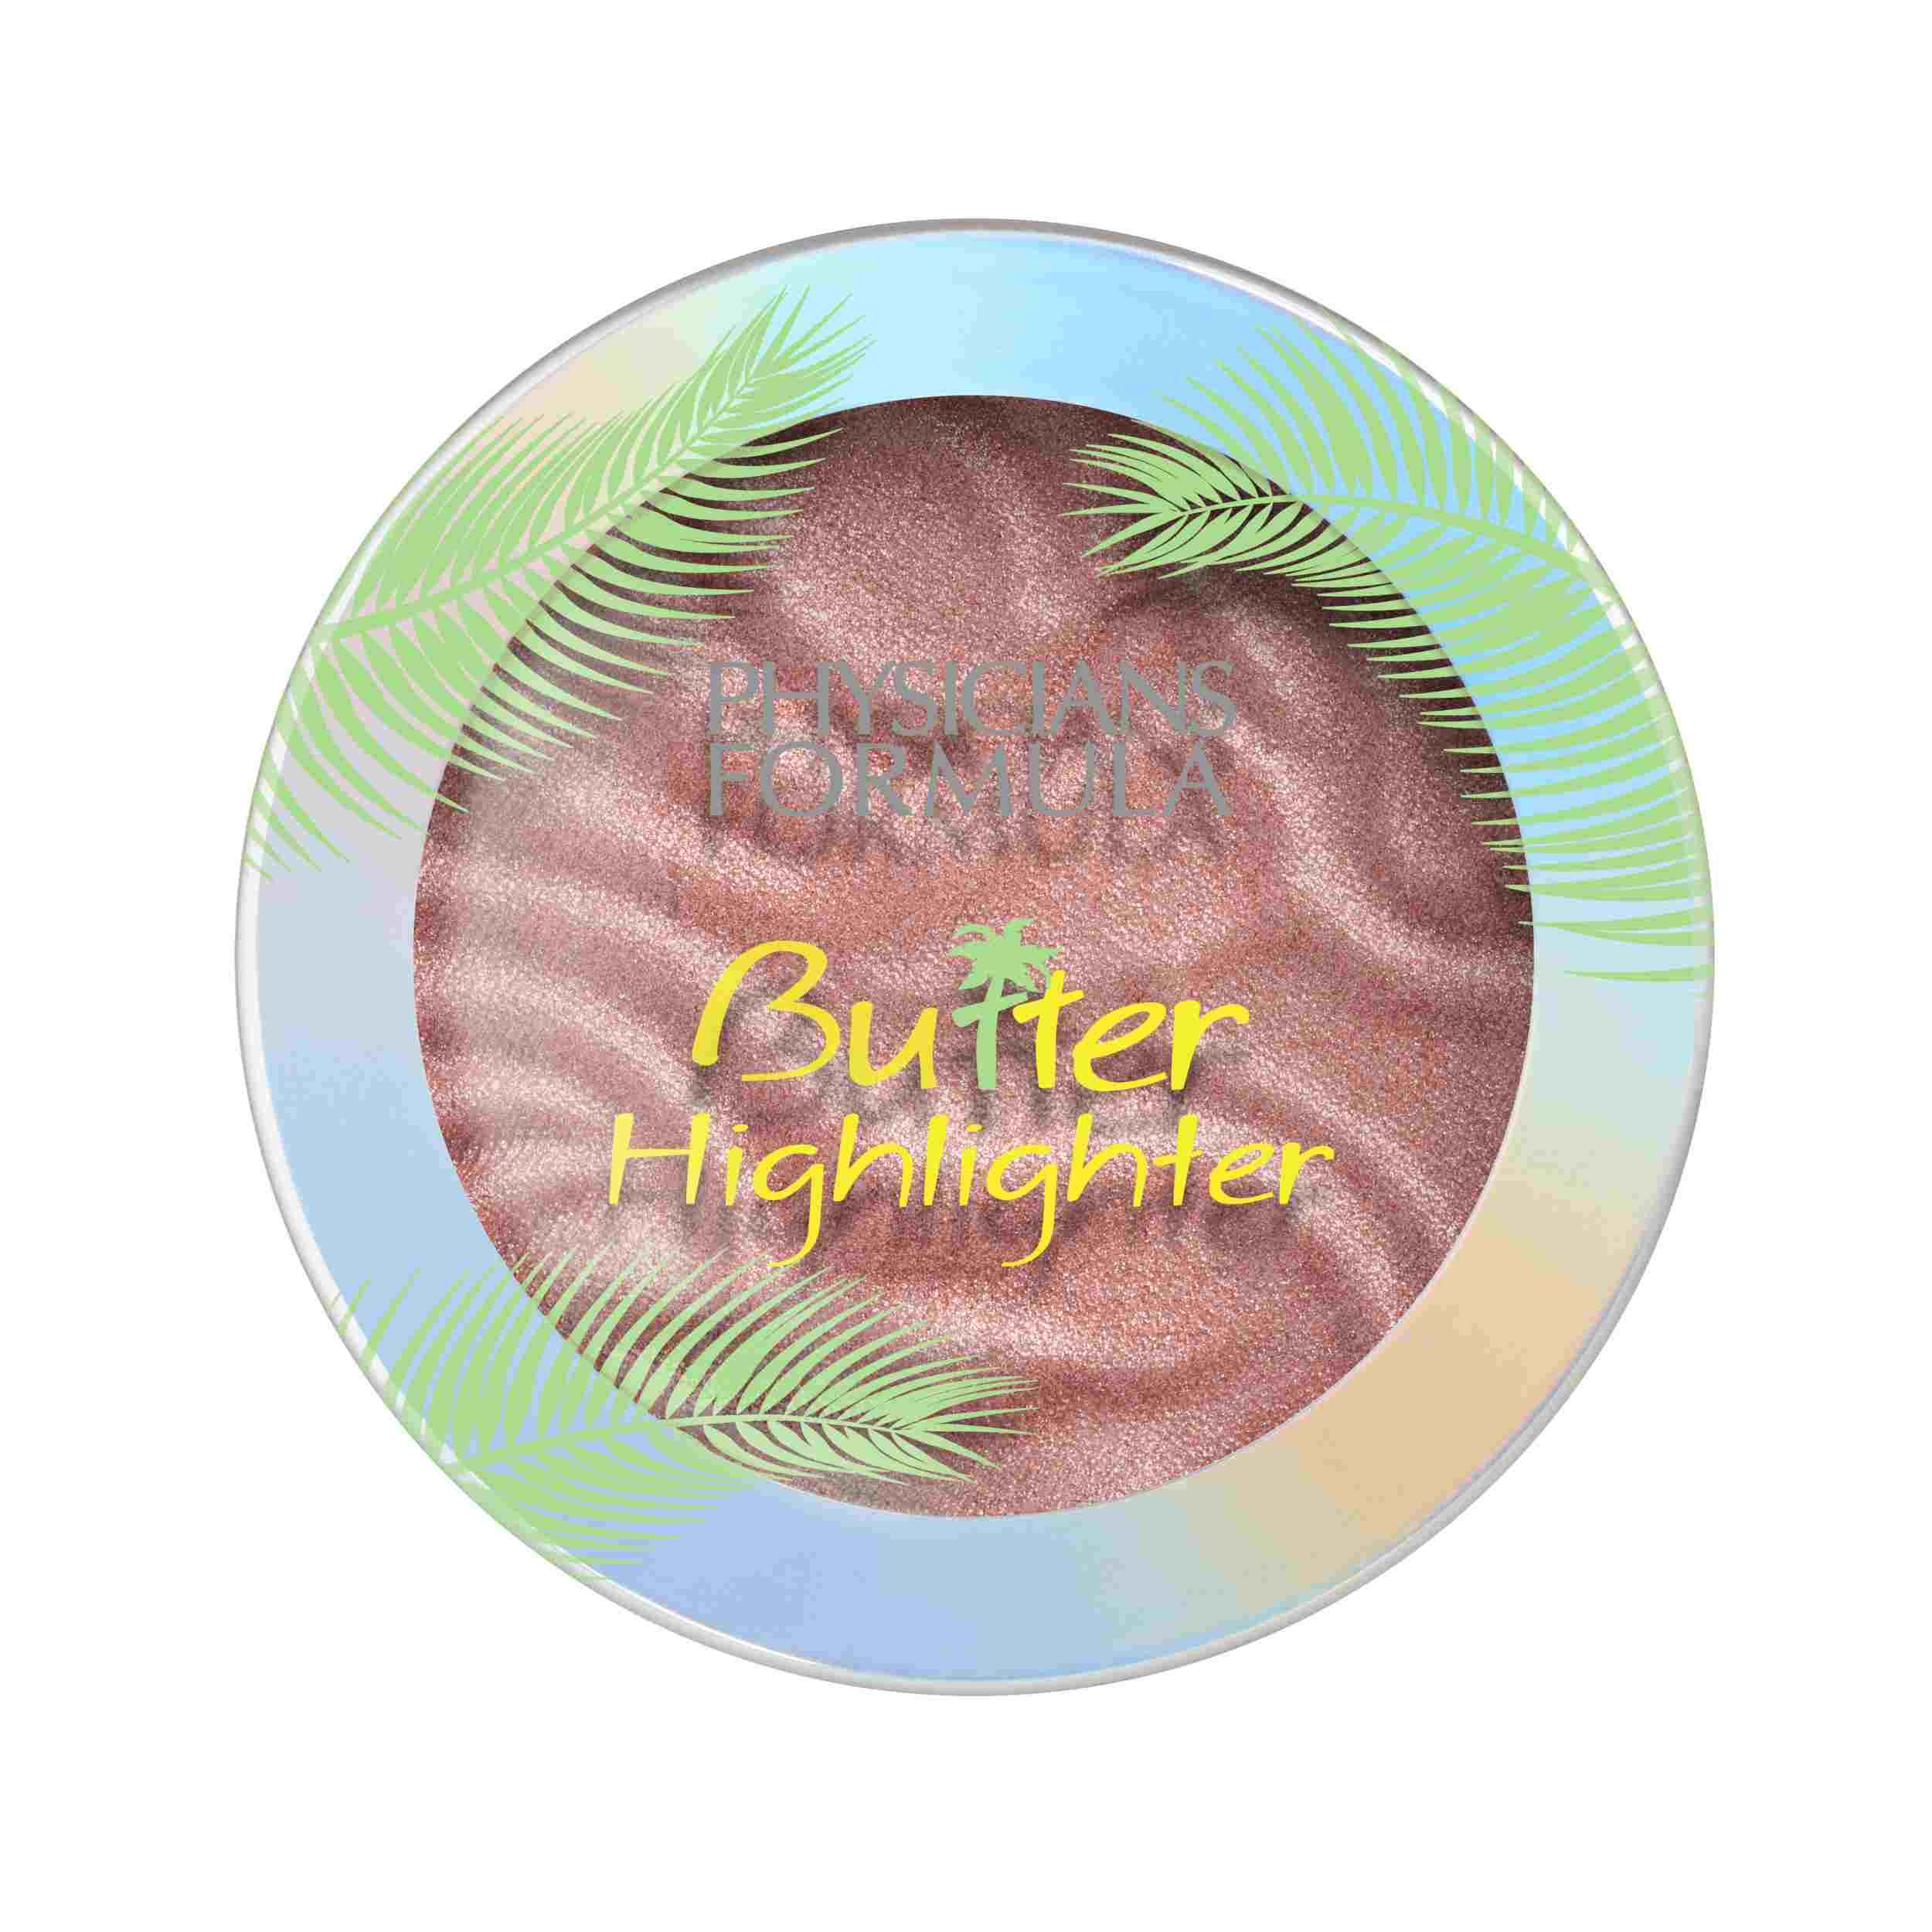 208693ac7d3 Physicians Formula Butter Highlighter. Courtesy of Walmart